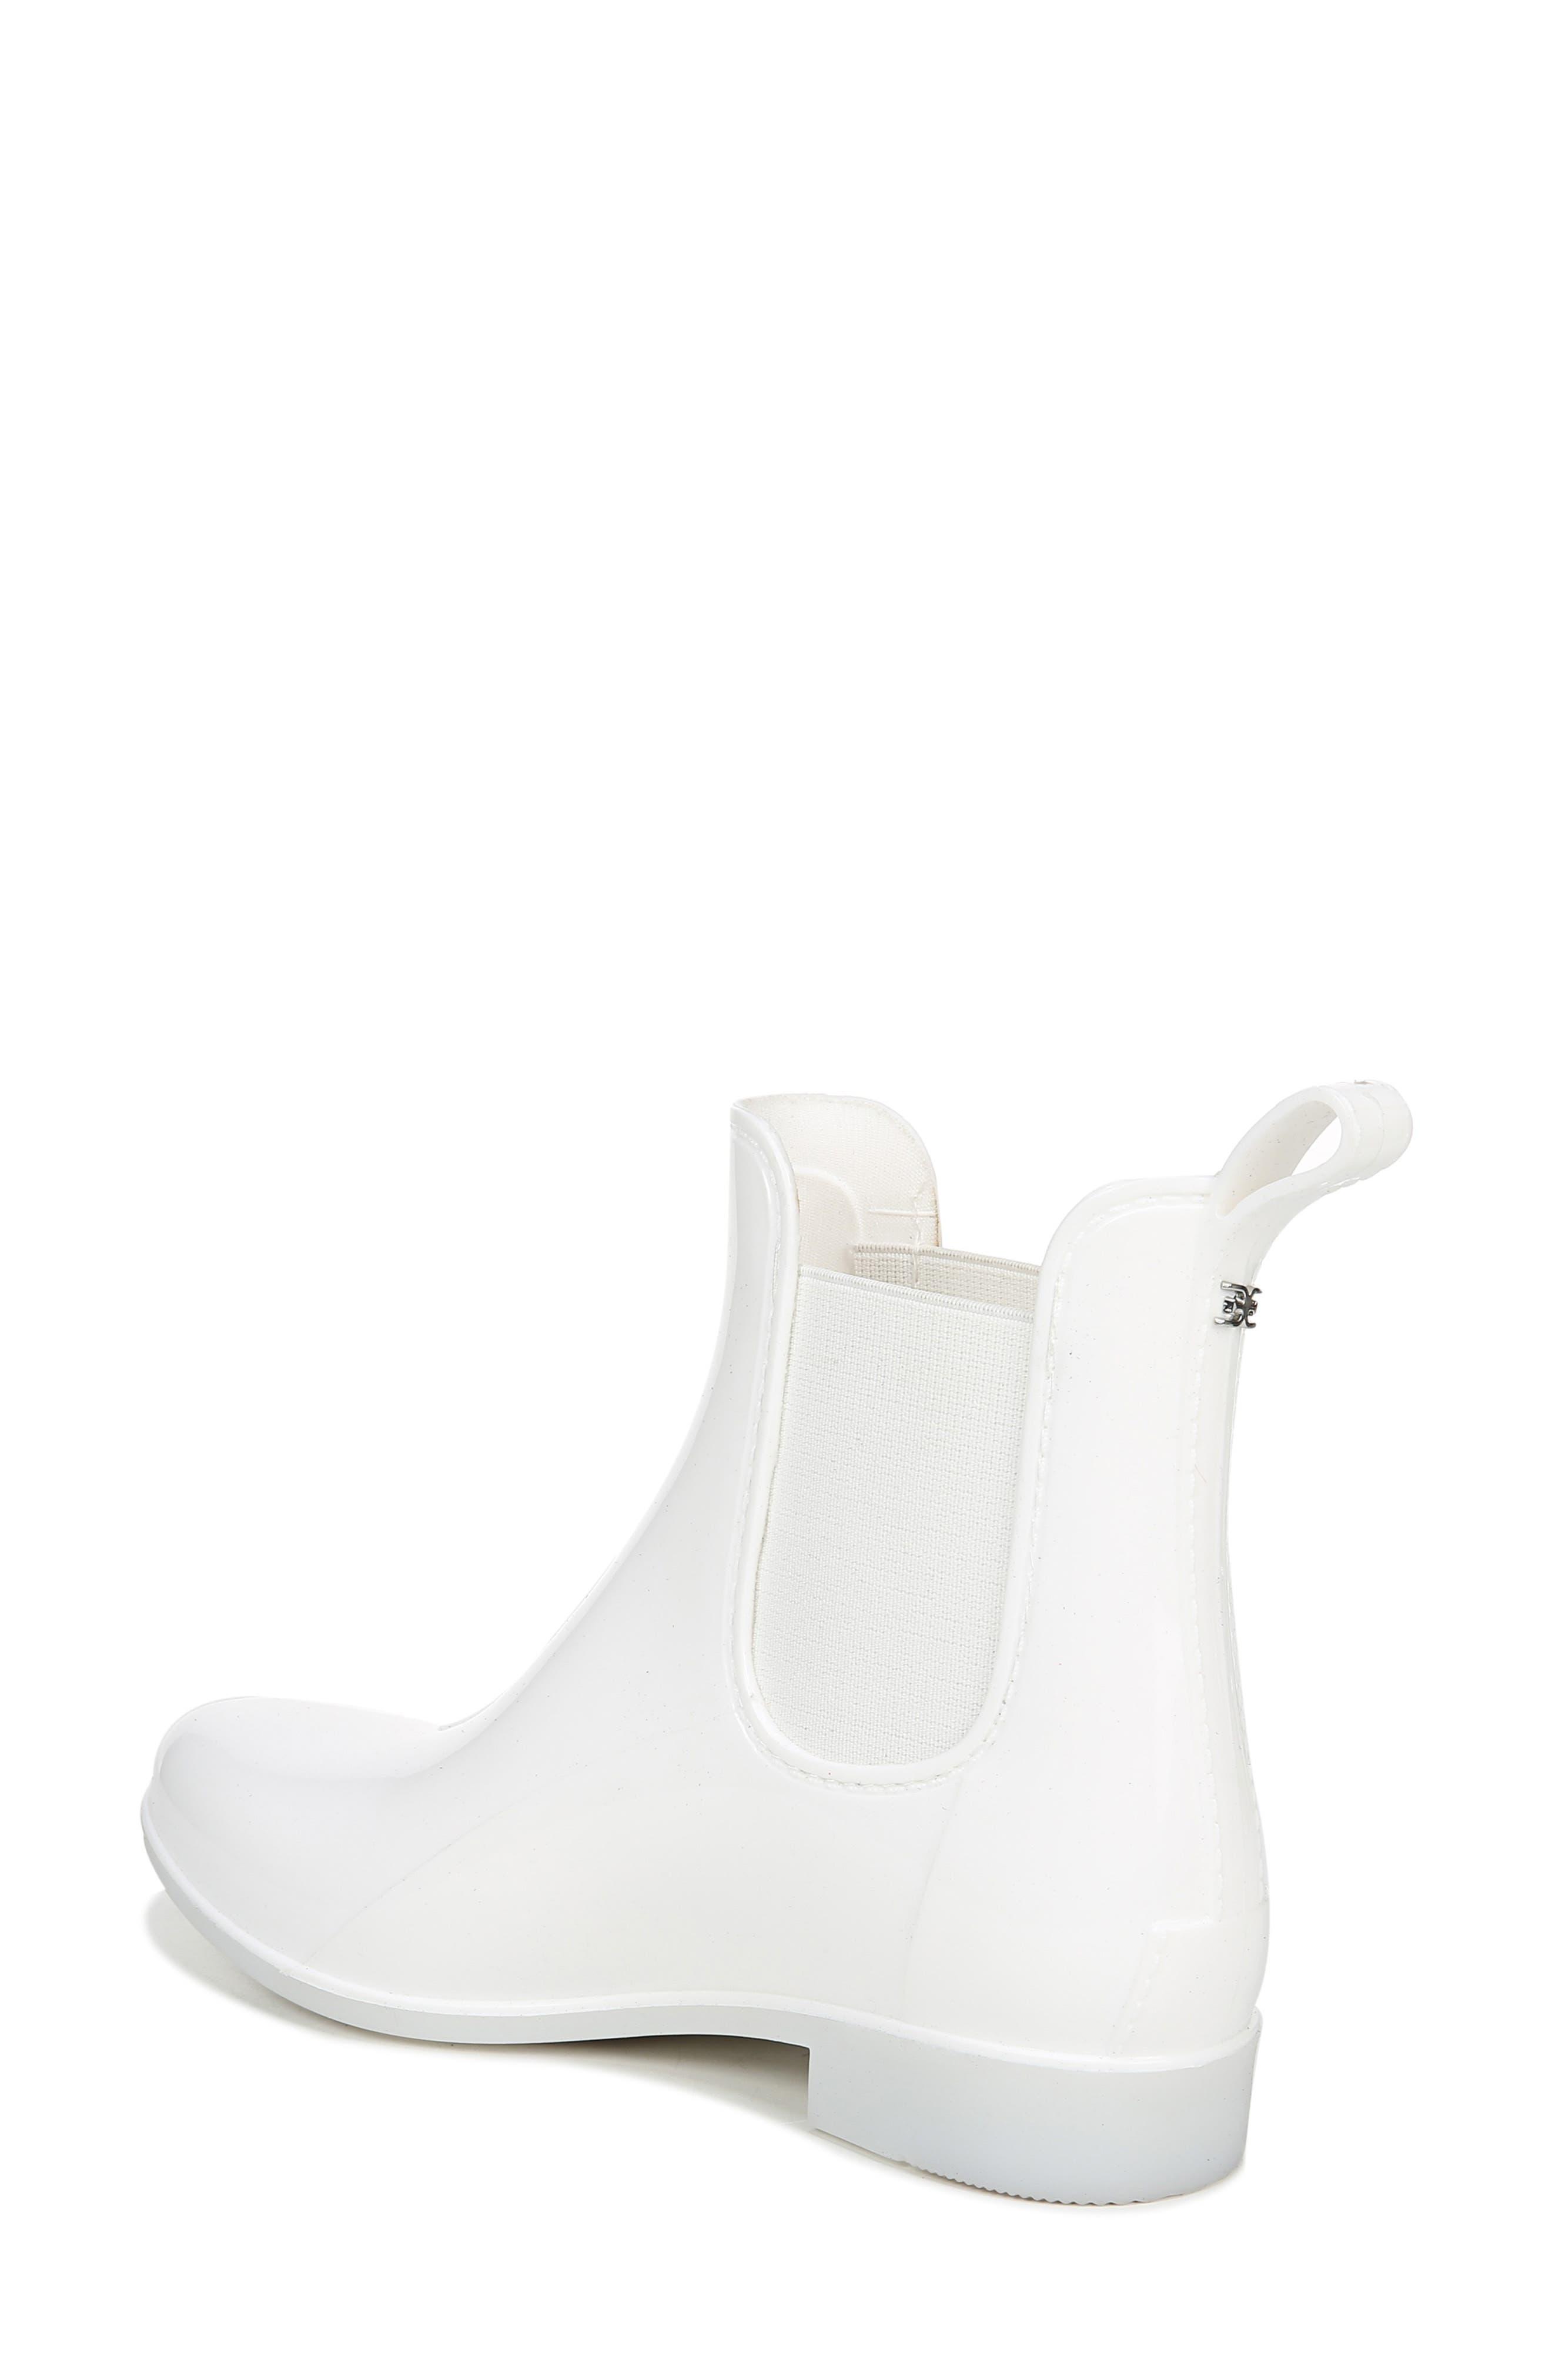 6c4c9b7070c Women's Sam Edelman Boots | Nordstrom